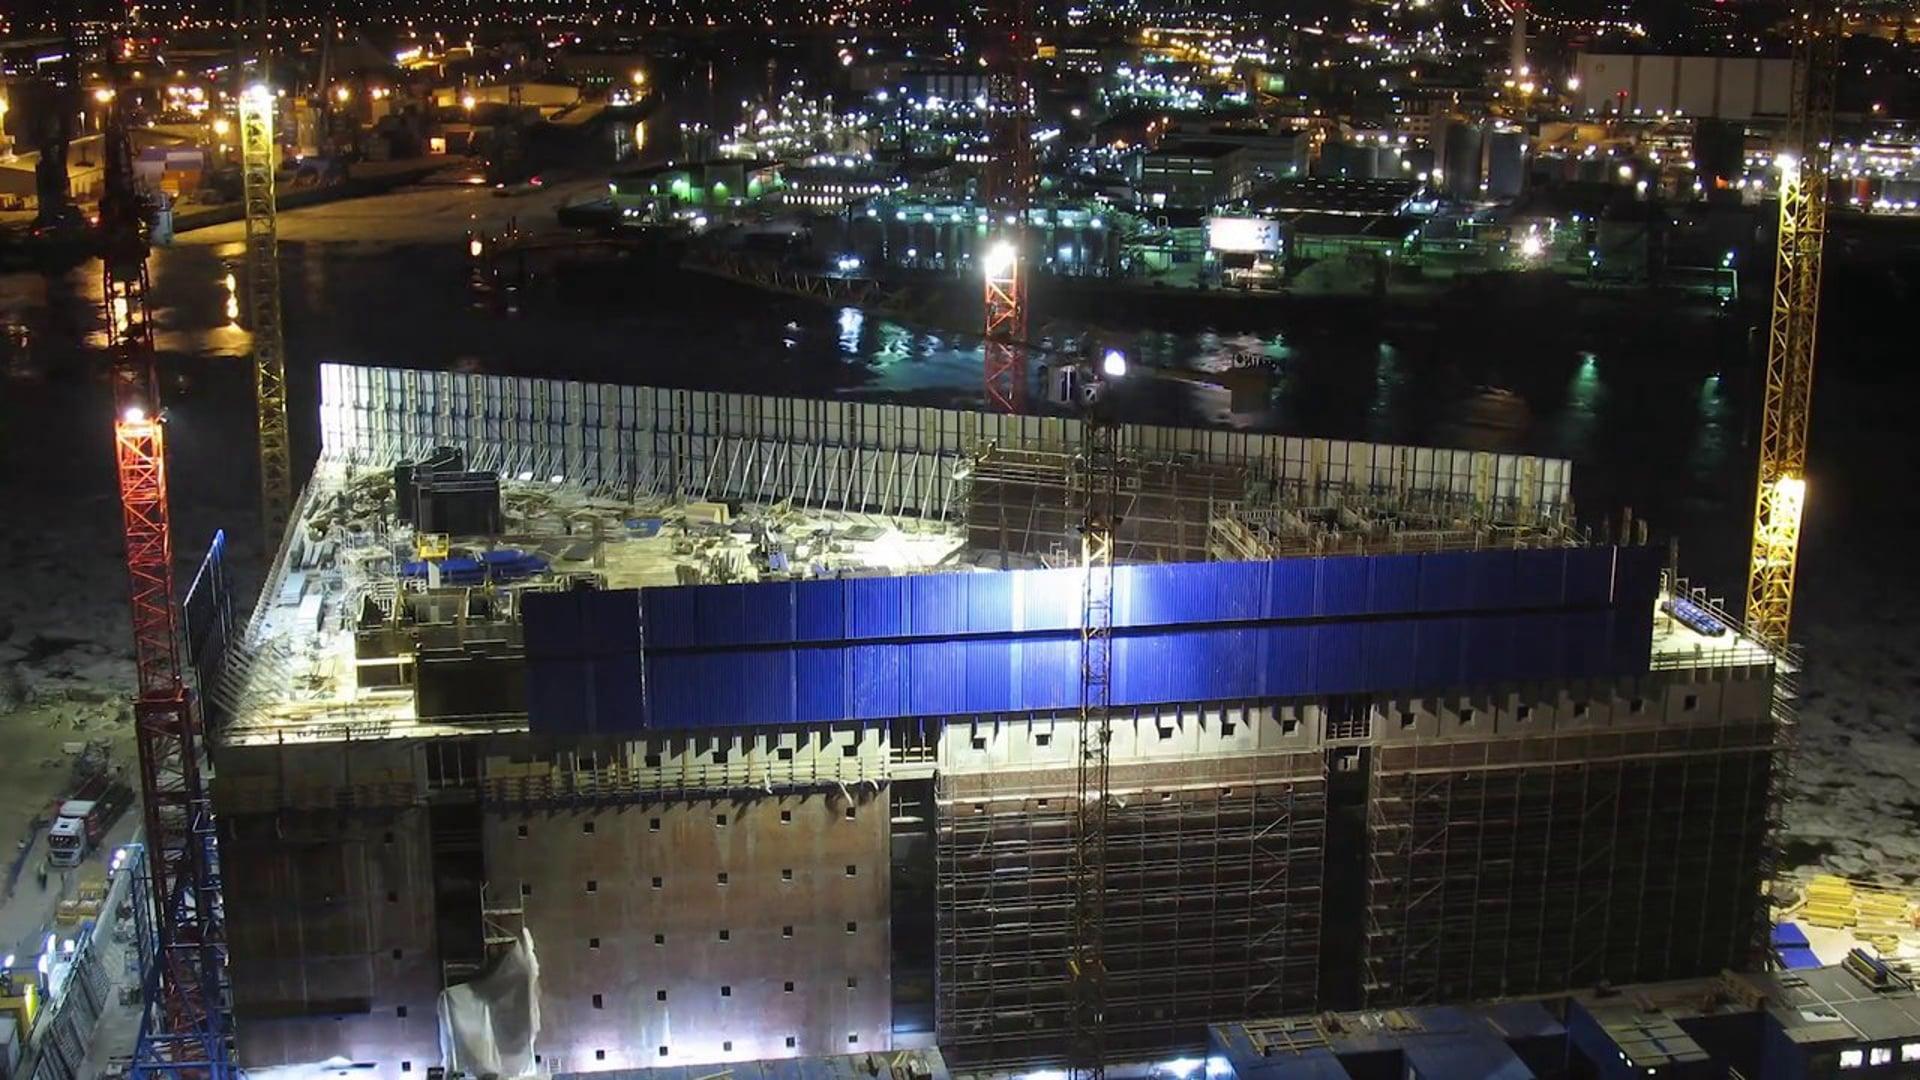 Bauzeitraffer Elbphilharmonie  - Elbe Philharmonic construction time lapse